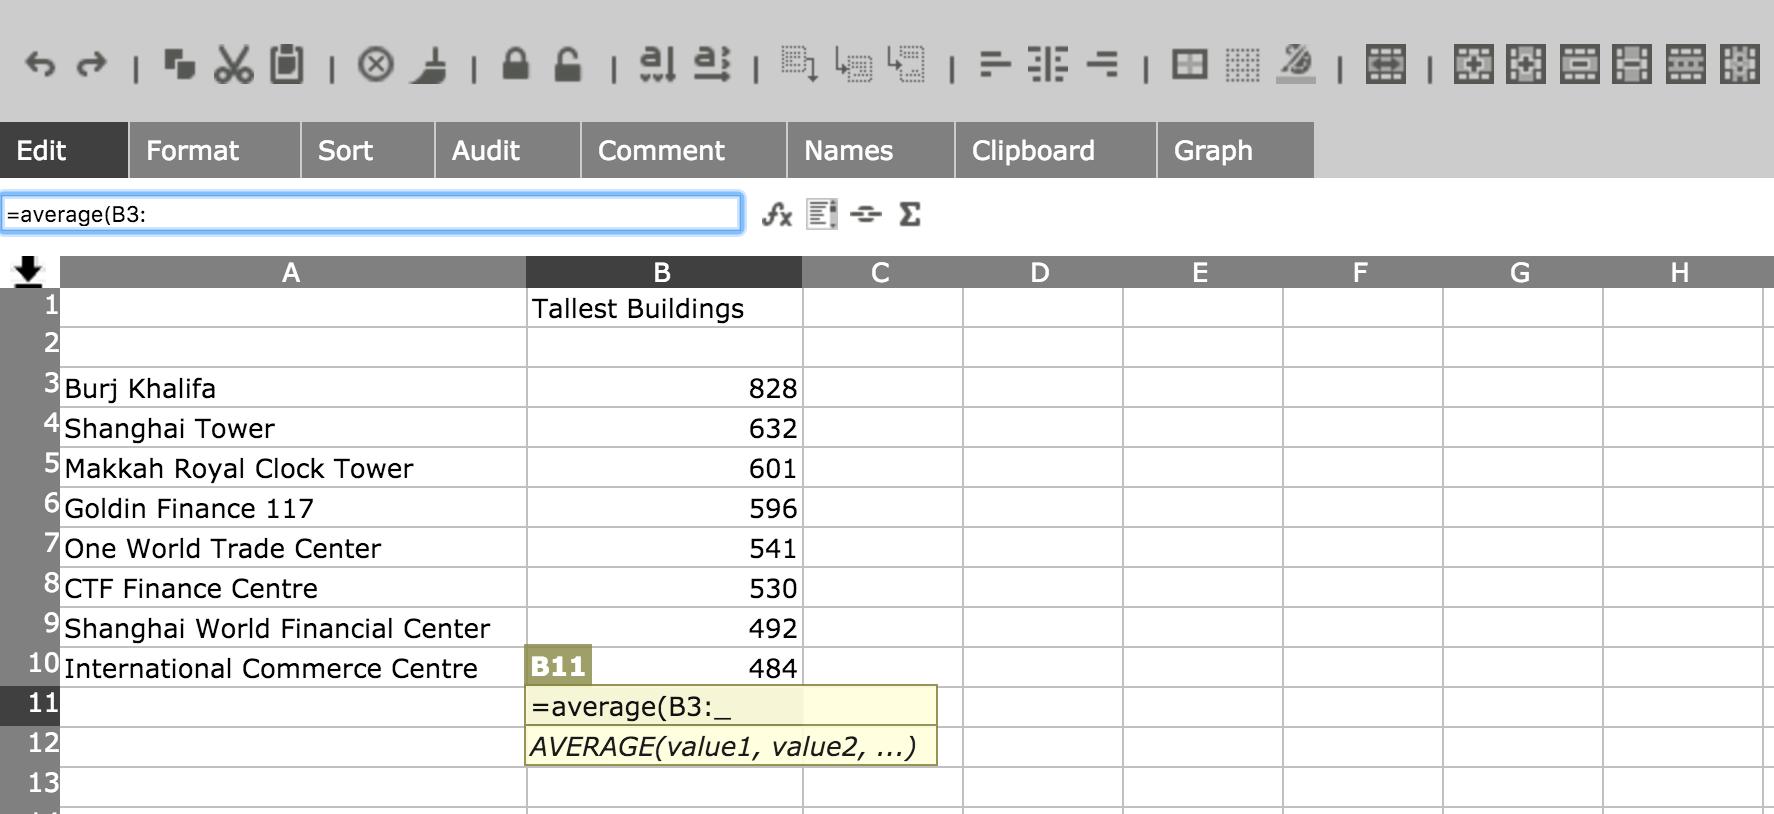 Workbooks shared workbook excel : Share Online Excel Spreadsheet | Natural Buff Dog